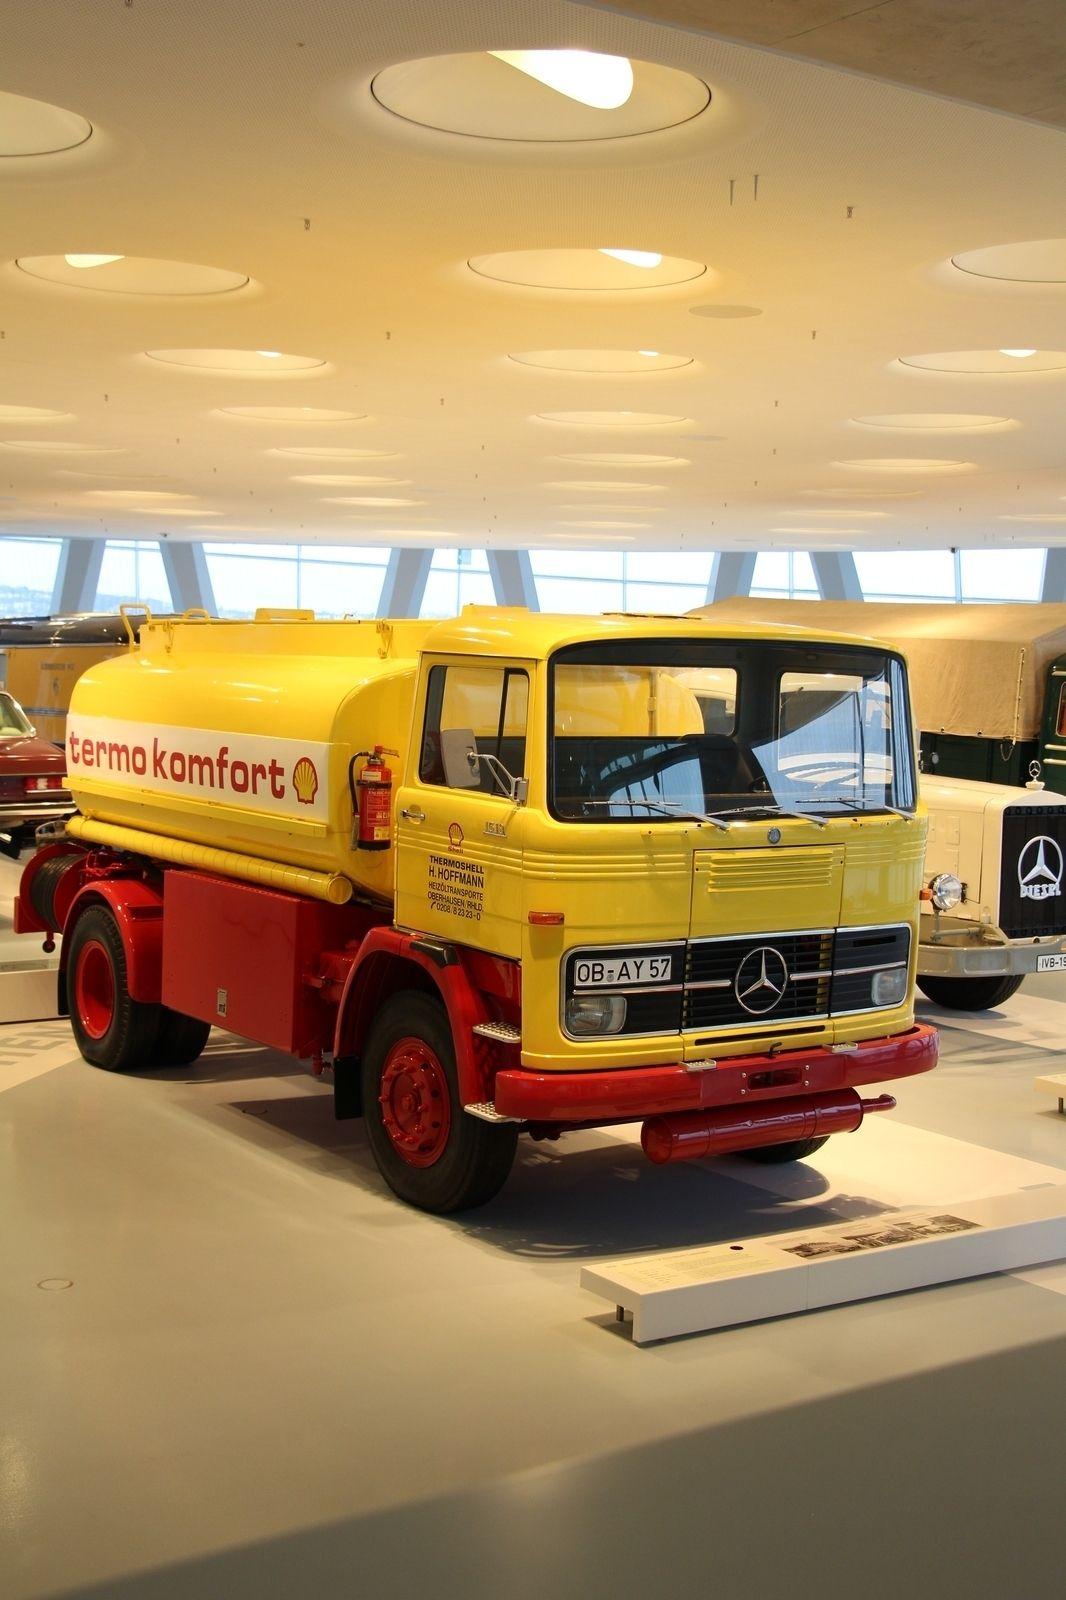 Mercedes benz lp 1513 fuil oil tank truck in 1965 mercedes benz introduced